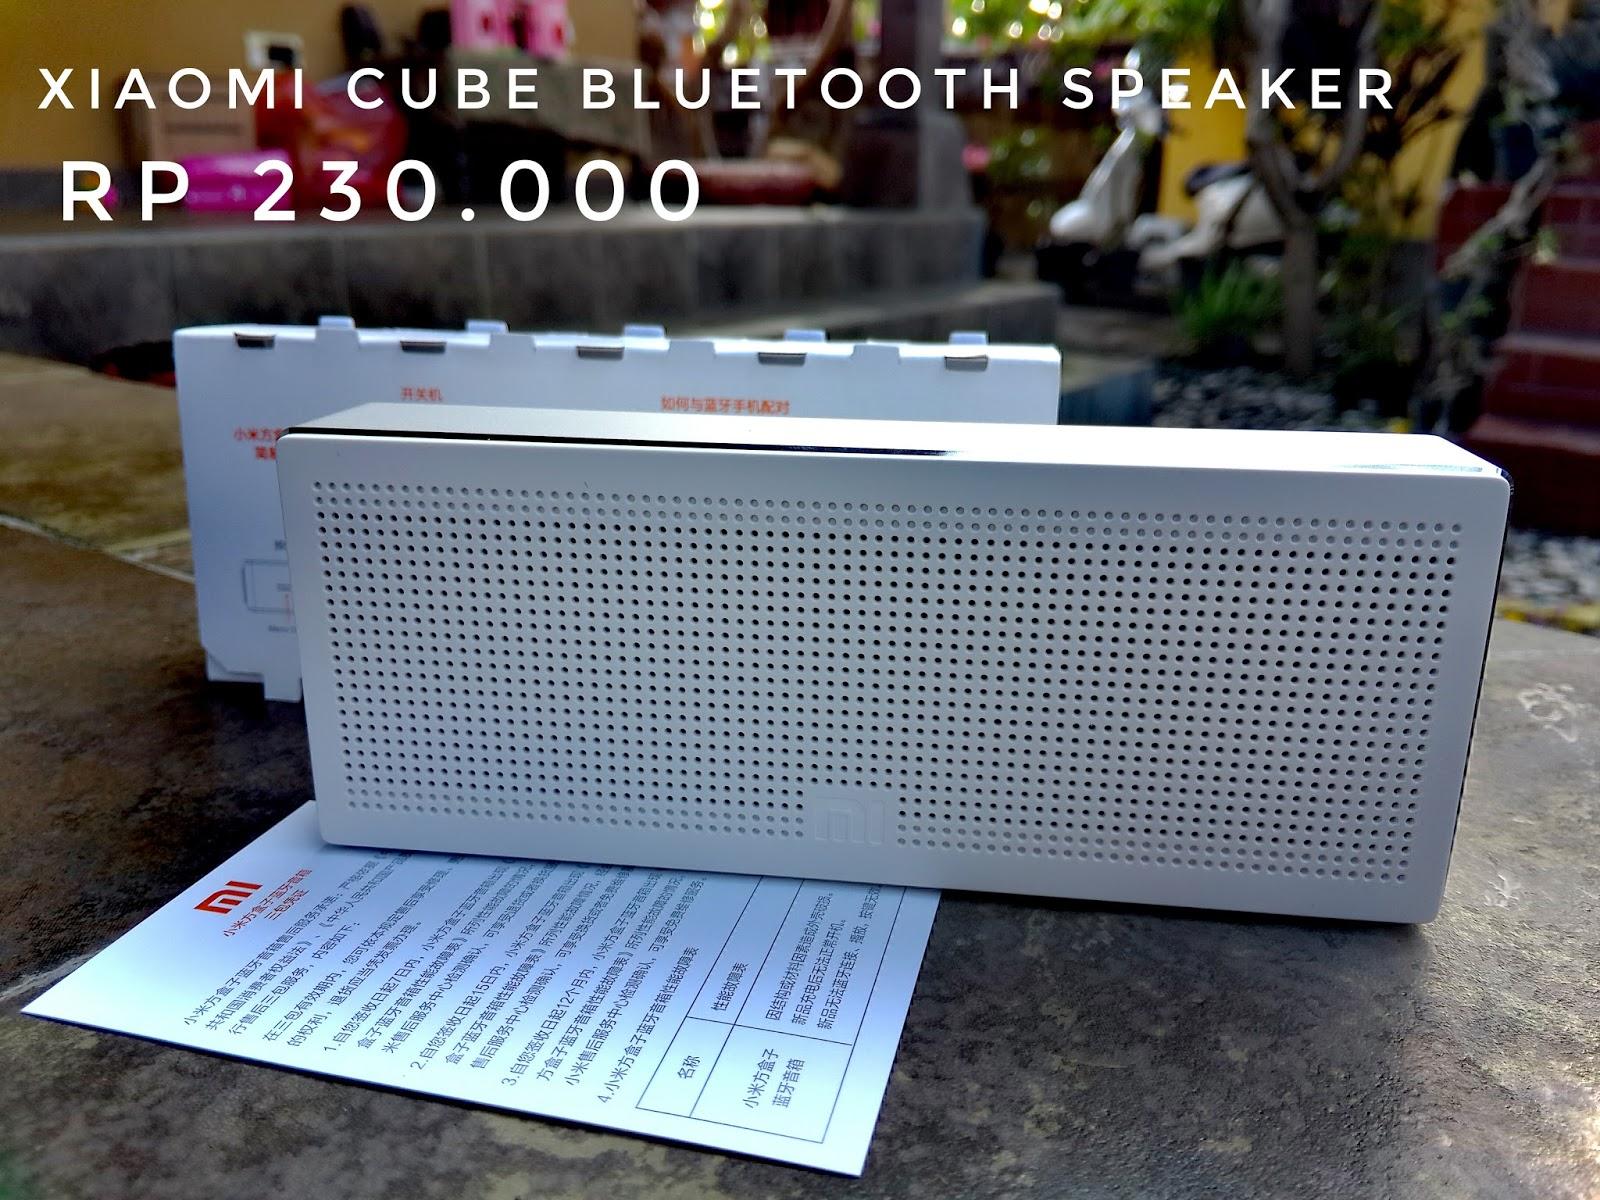 Abitech Bali Speaker Bluetooth Portable Xiaomi Cube Warna Putih Original Harga 230rb Stock Kosong Kualitas Bagus Diharga Yang Murah Bass Mantap Berani Diadu Dengan Lebih Mahal